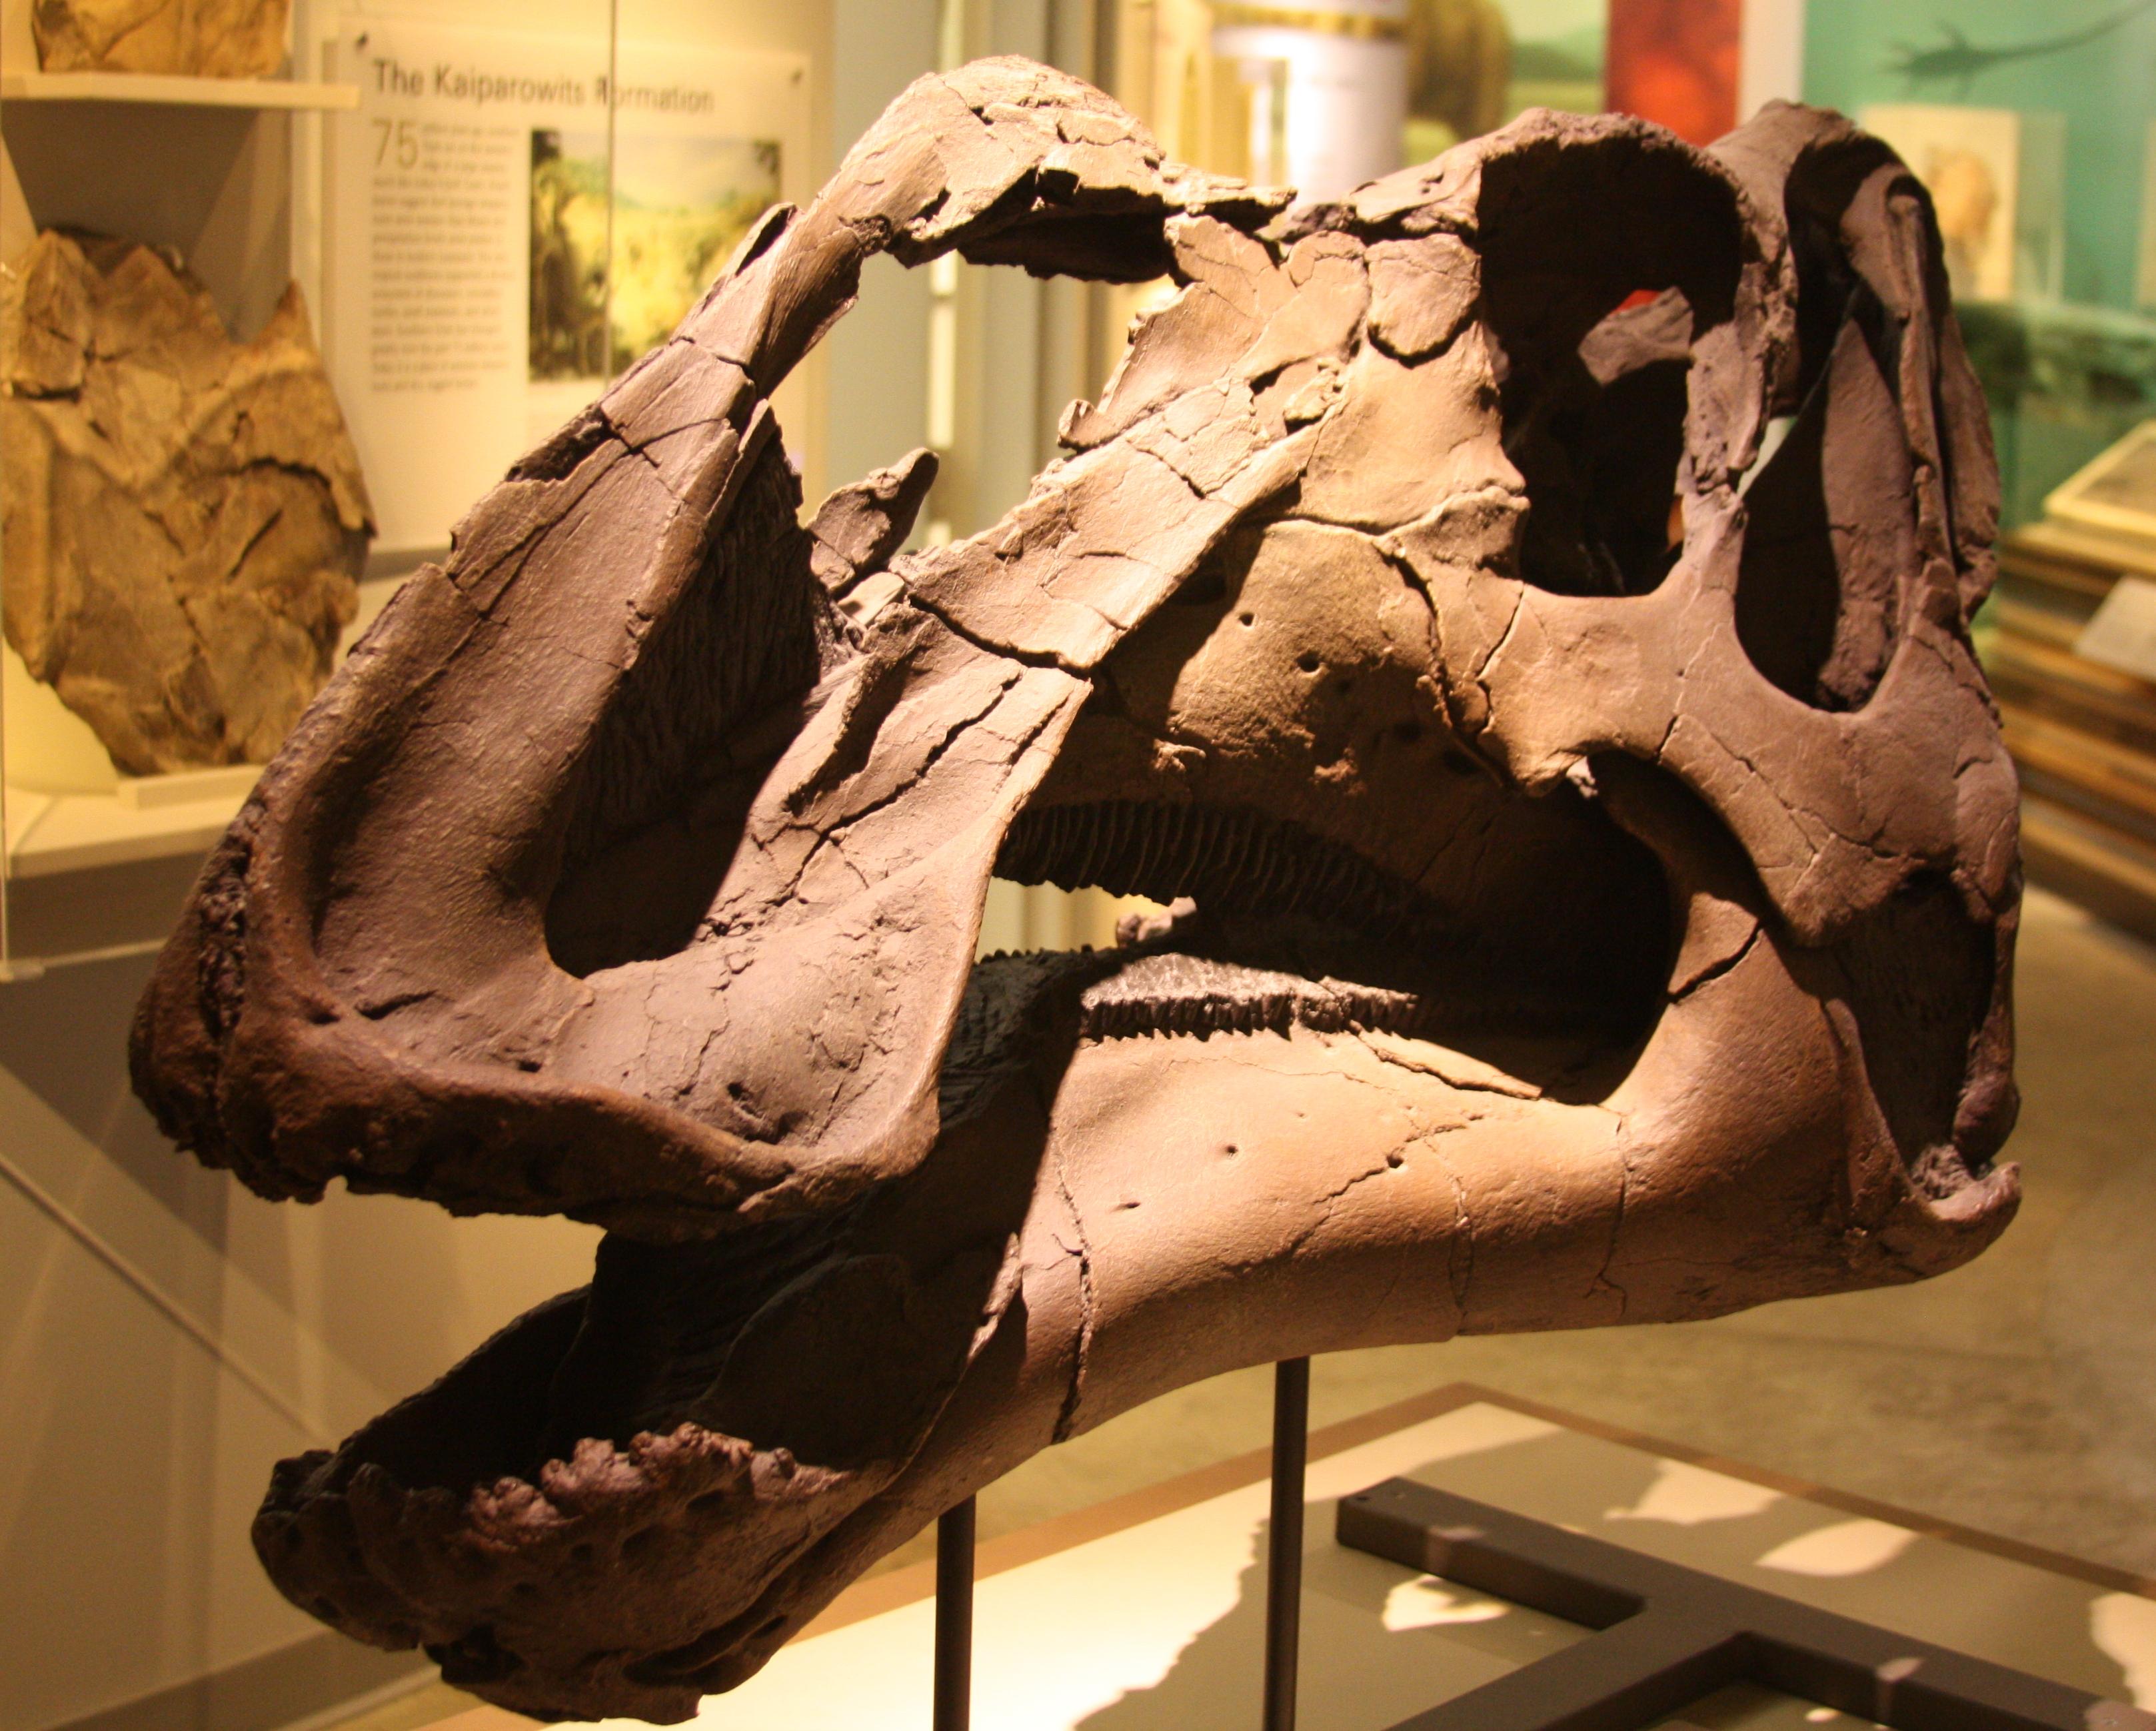 https://upload.wikimedia.org/wikipedia/commons/7/7d/Gryposaurus_Monumentsis_Skull%2C_Alf_Museum.JPG